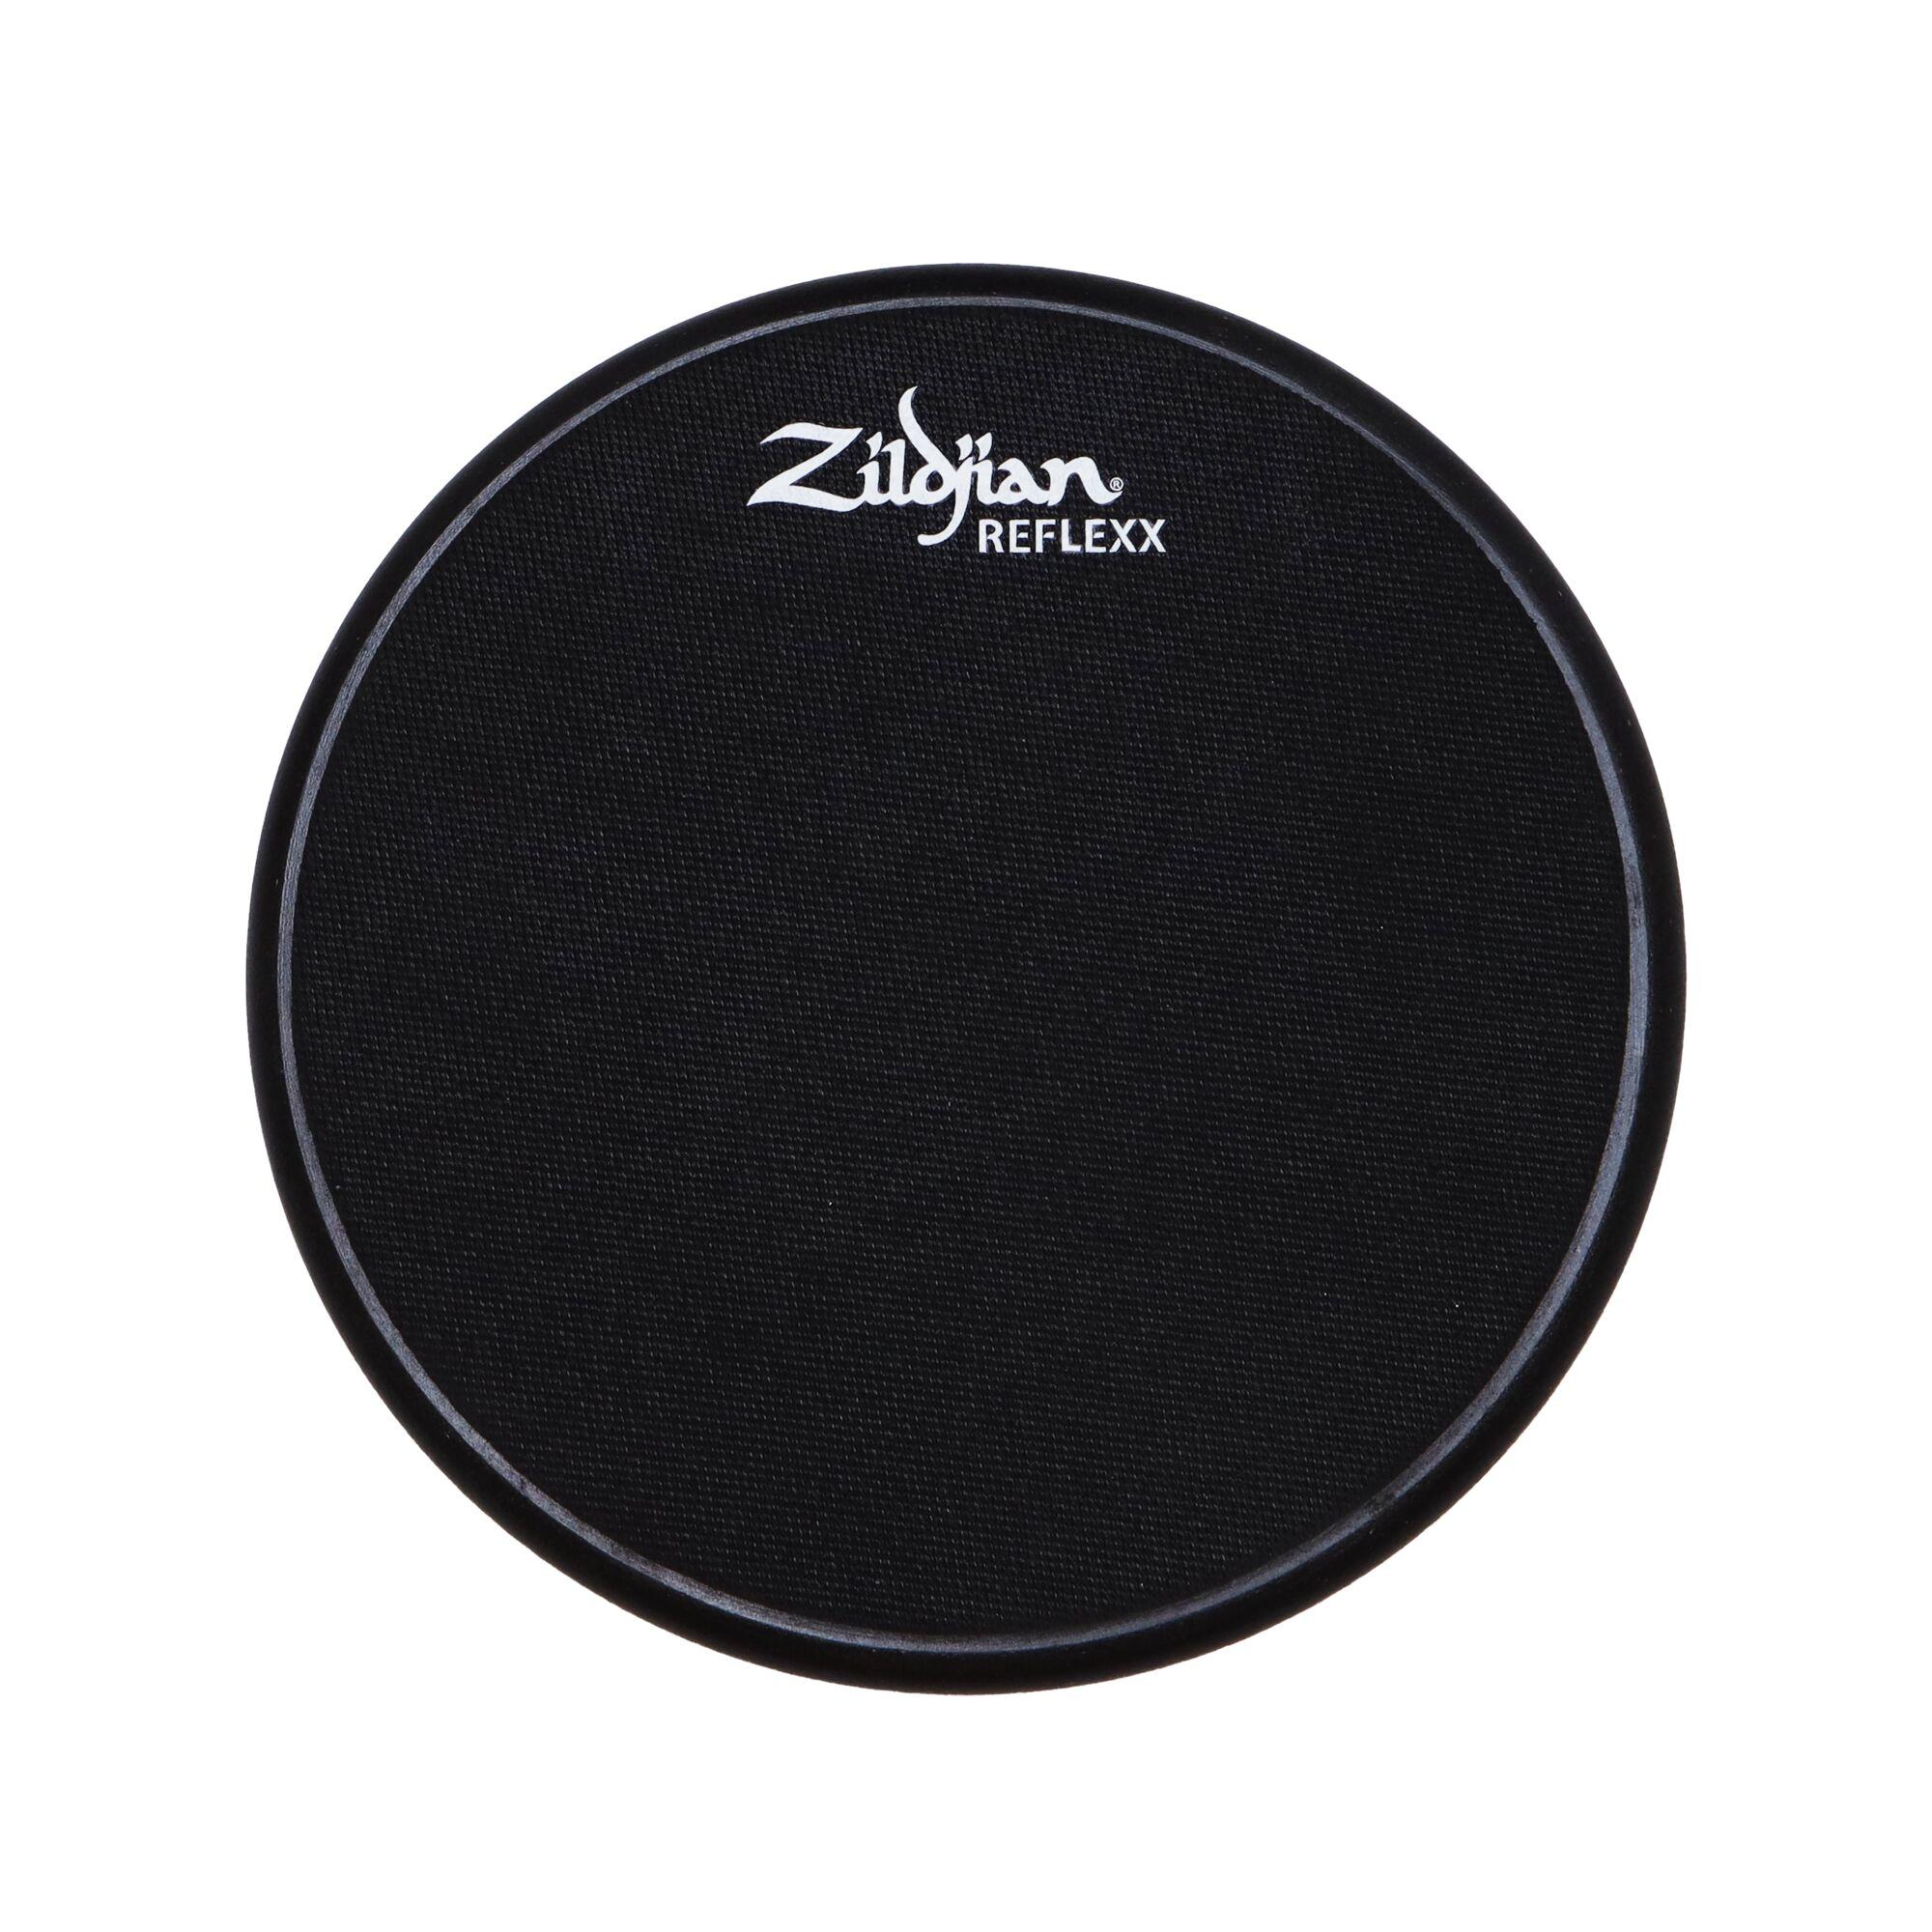 "Zildjian 10"" Reflexx Conditioning Pad"